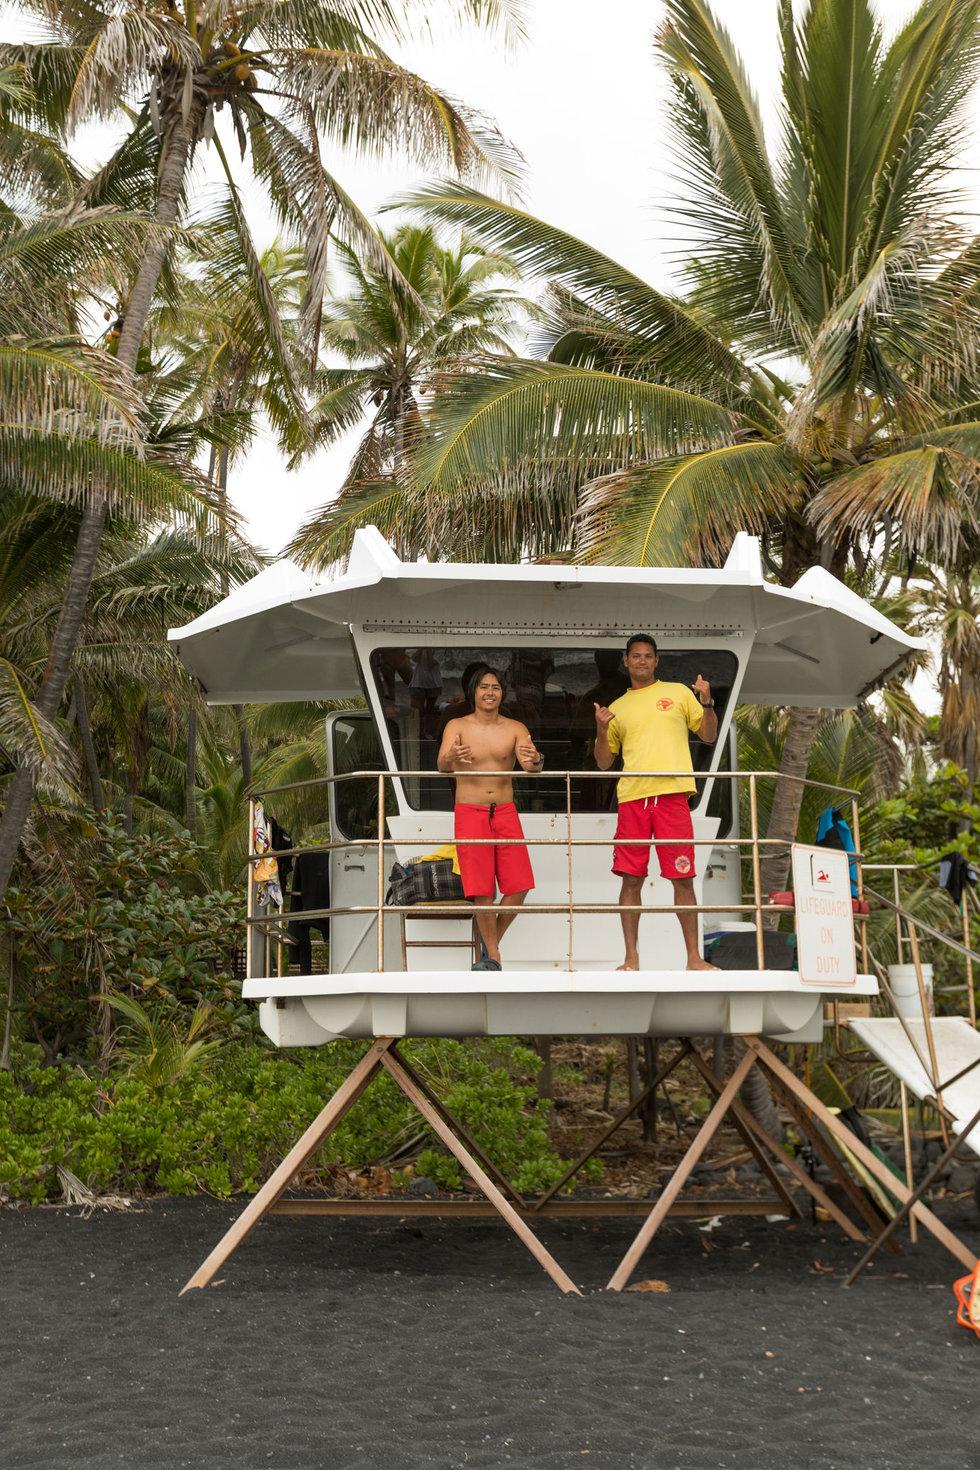 Lifeguards at Punalu'u black-sand beach